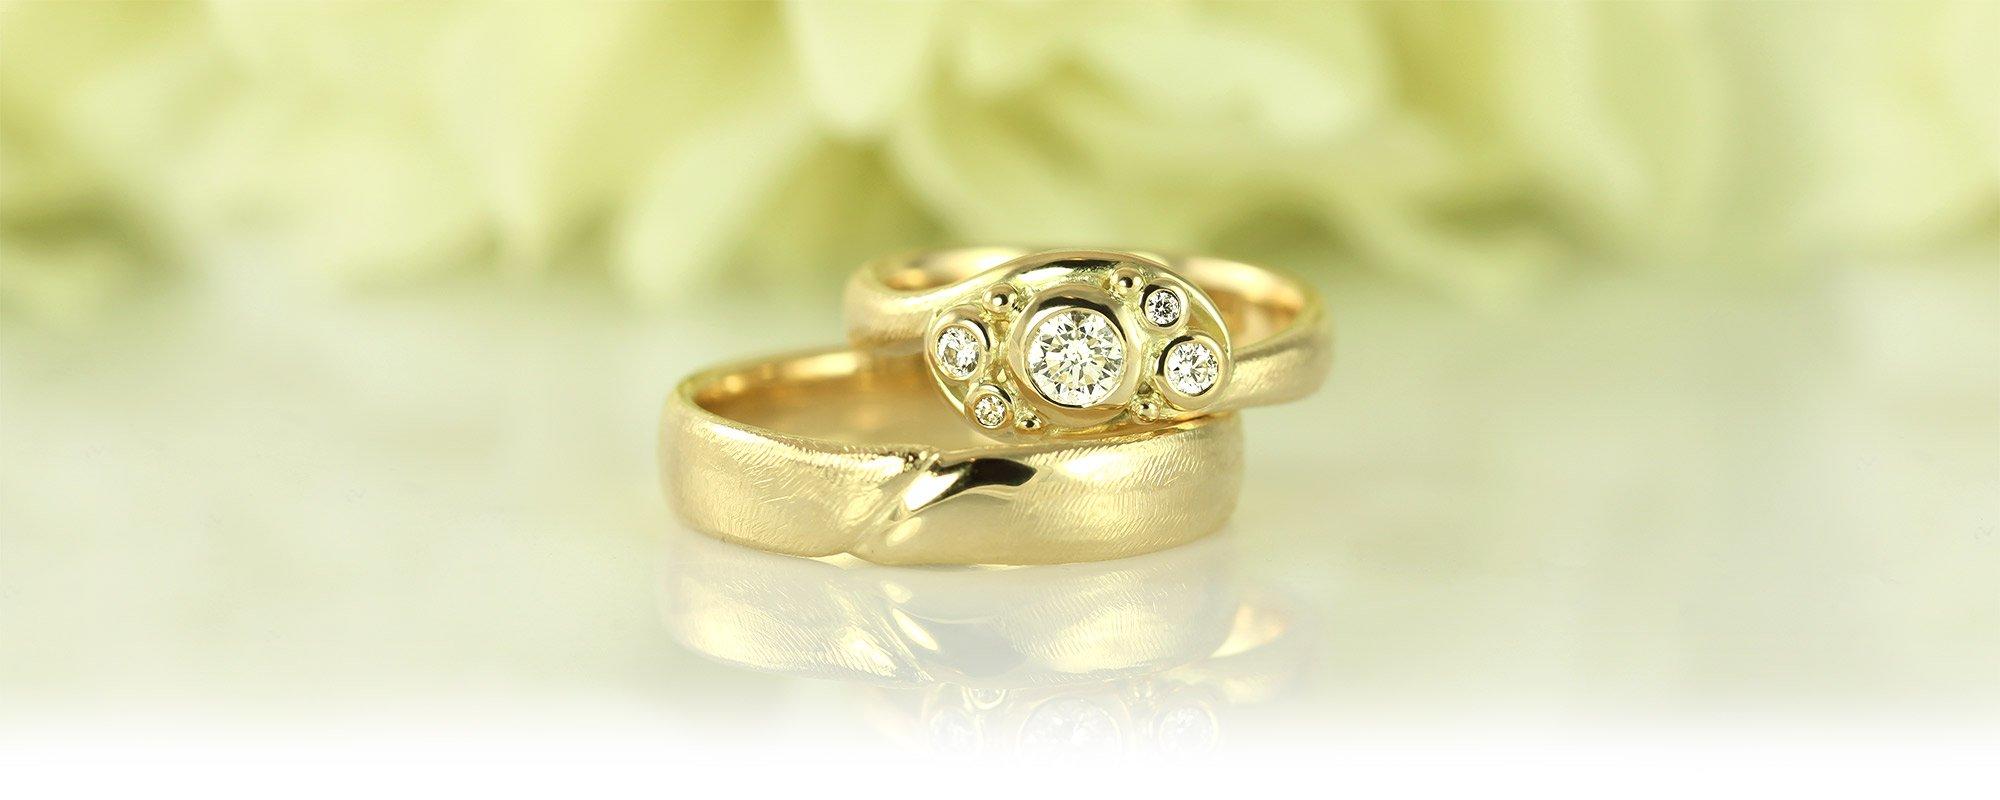 86987b81ac0 Engagement rings - Luxury wedding ring with diamonds